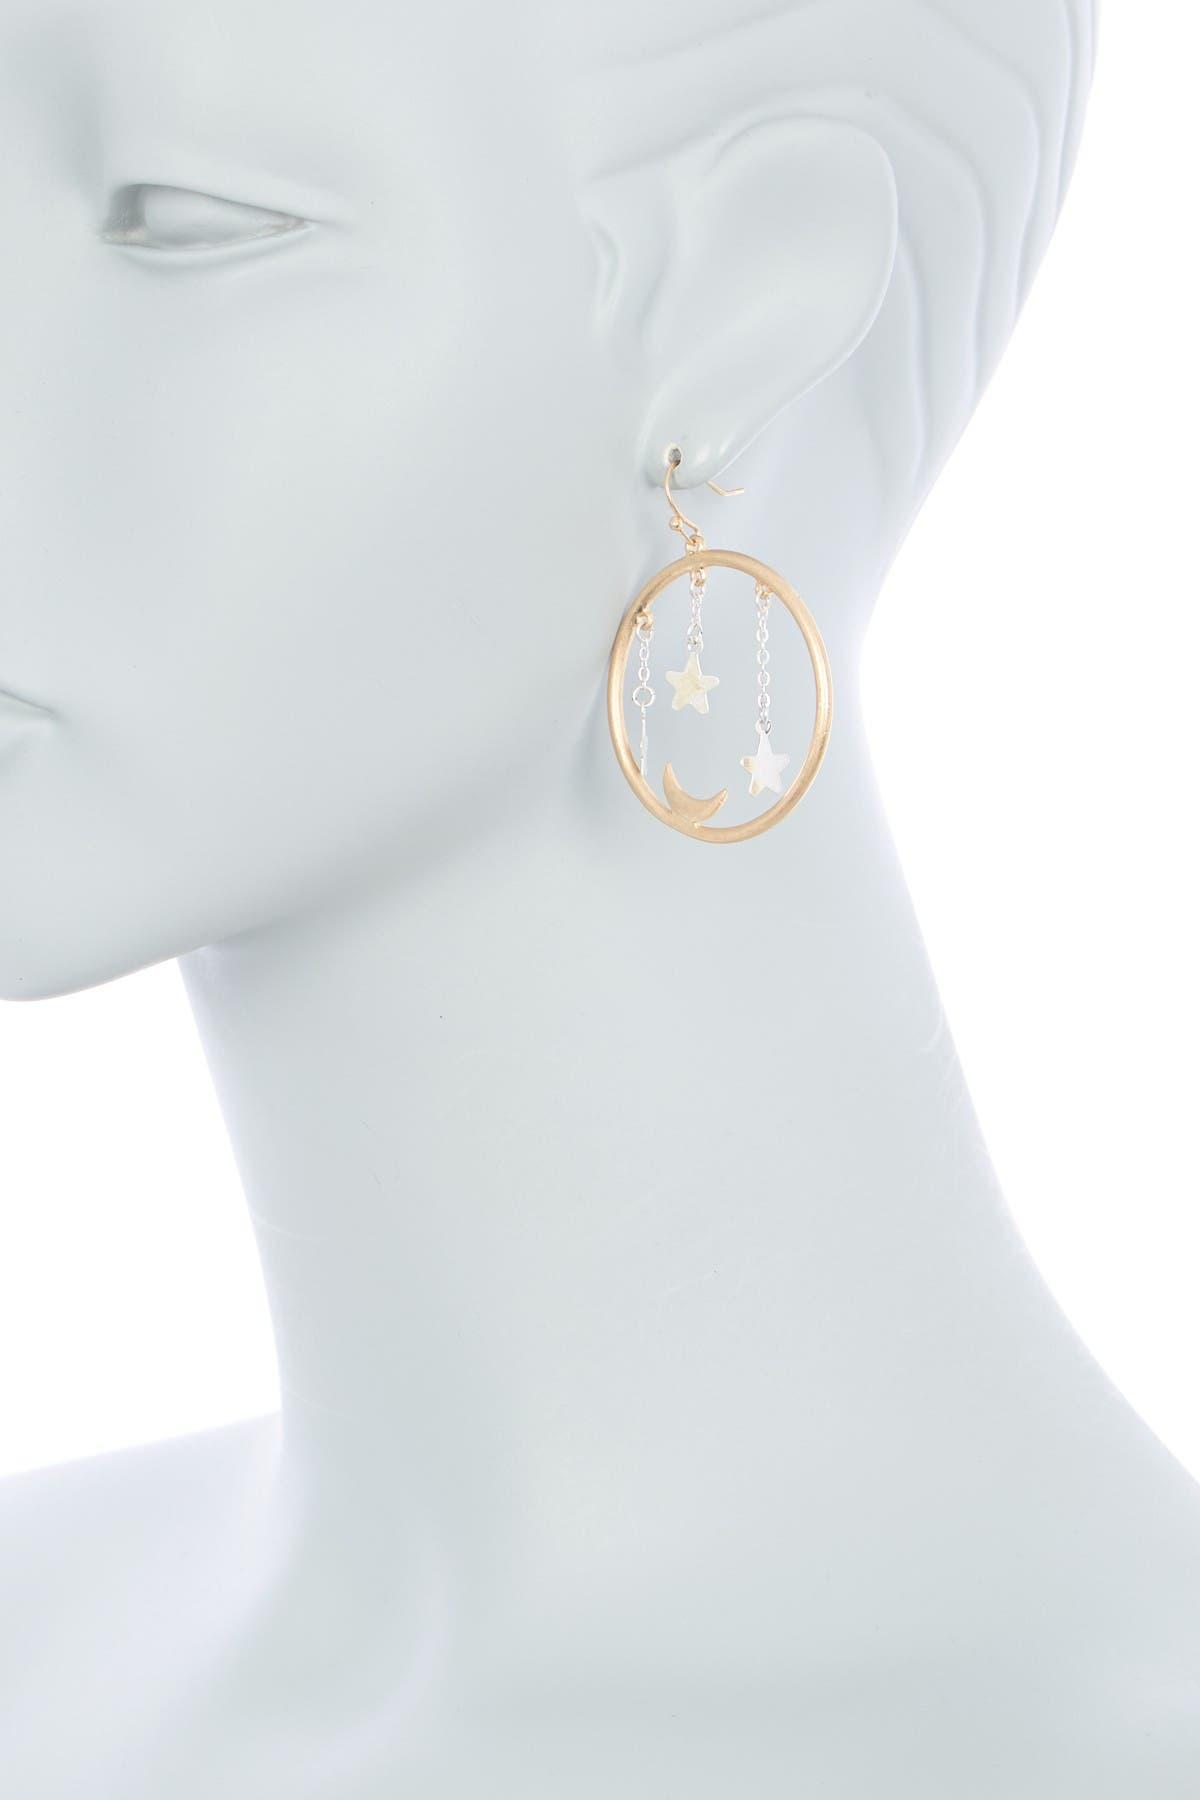 Image of AREA STARS Two-Tone Celestial Circle Drop Earrings